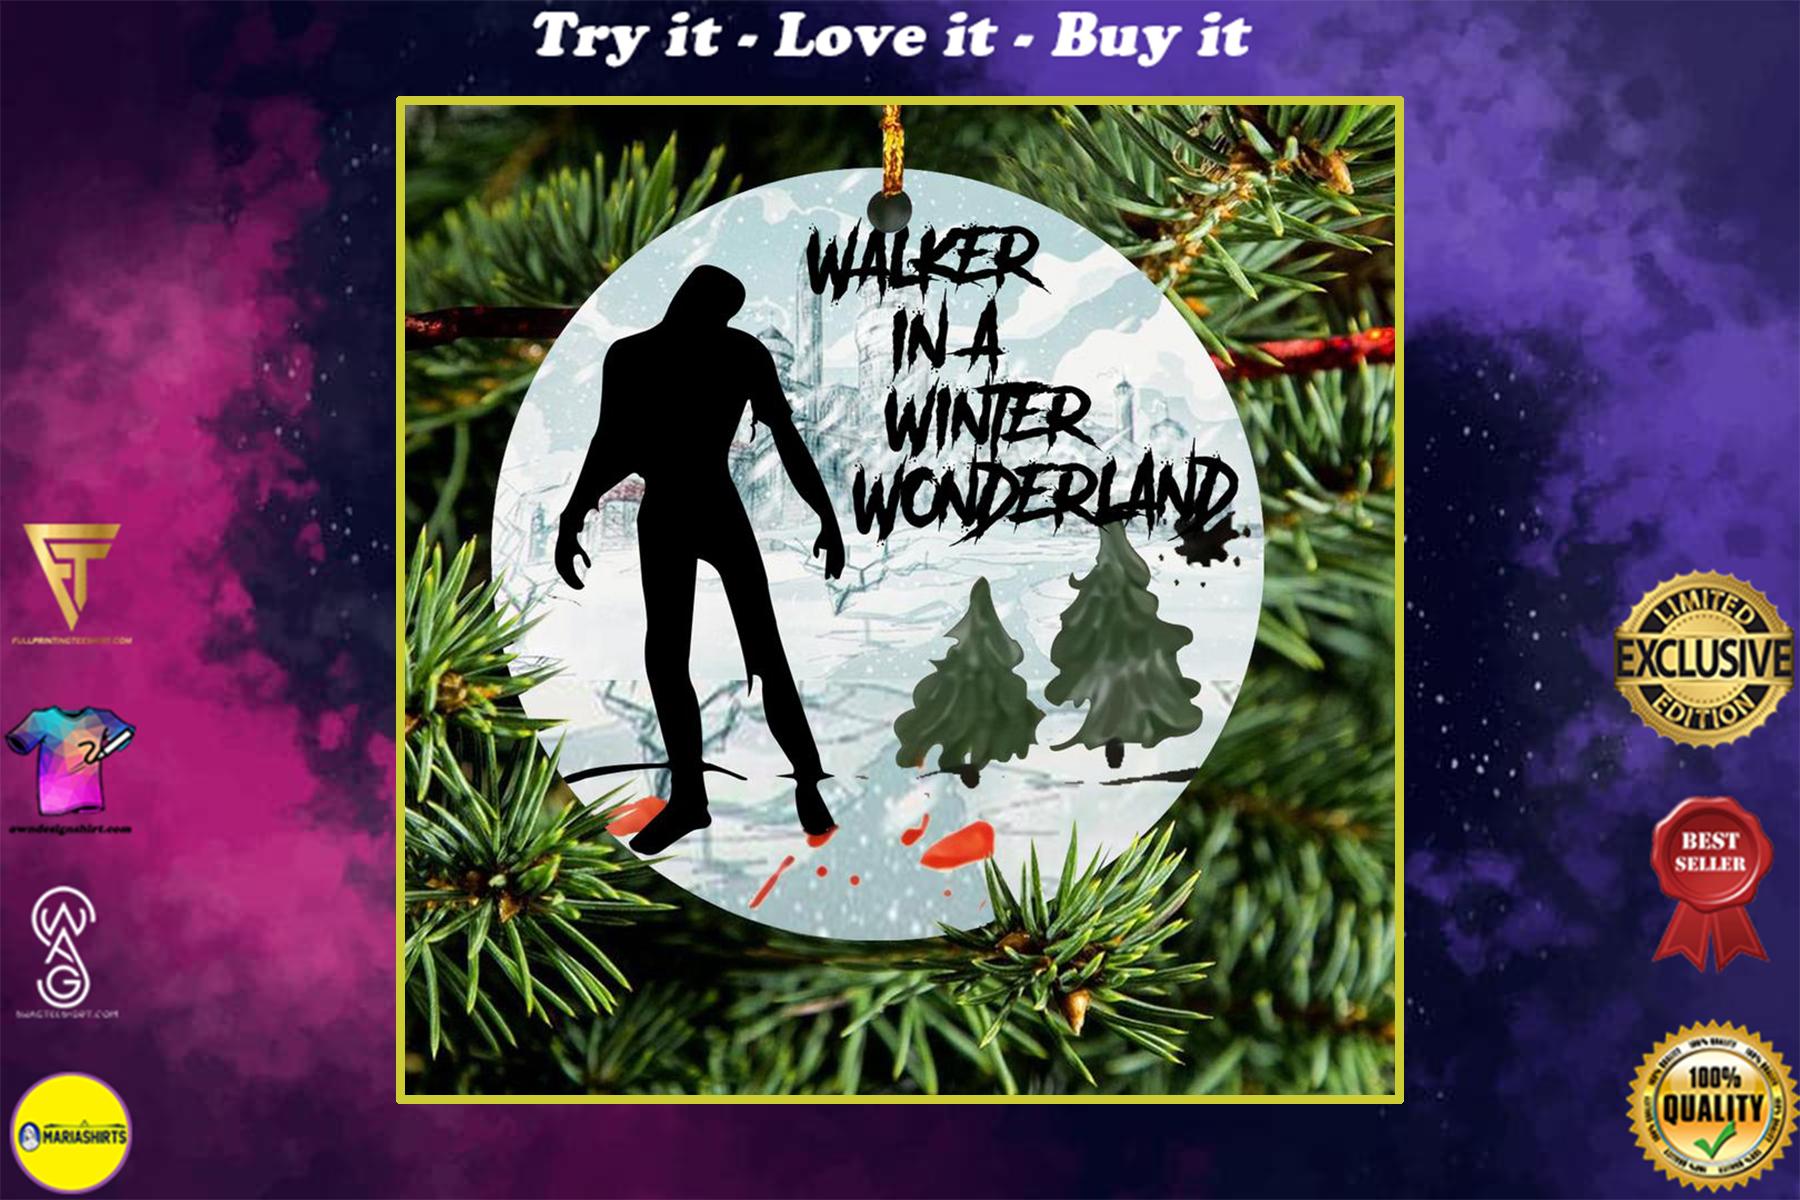 walker in a winter wonderland christmas ornament